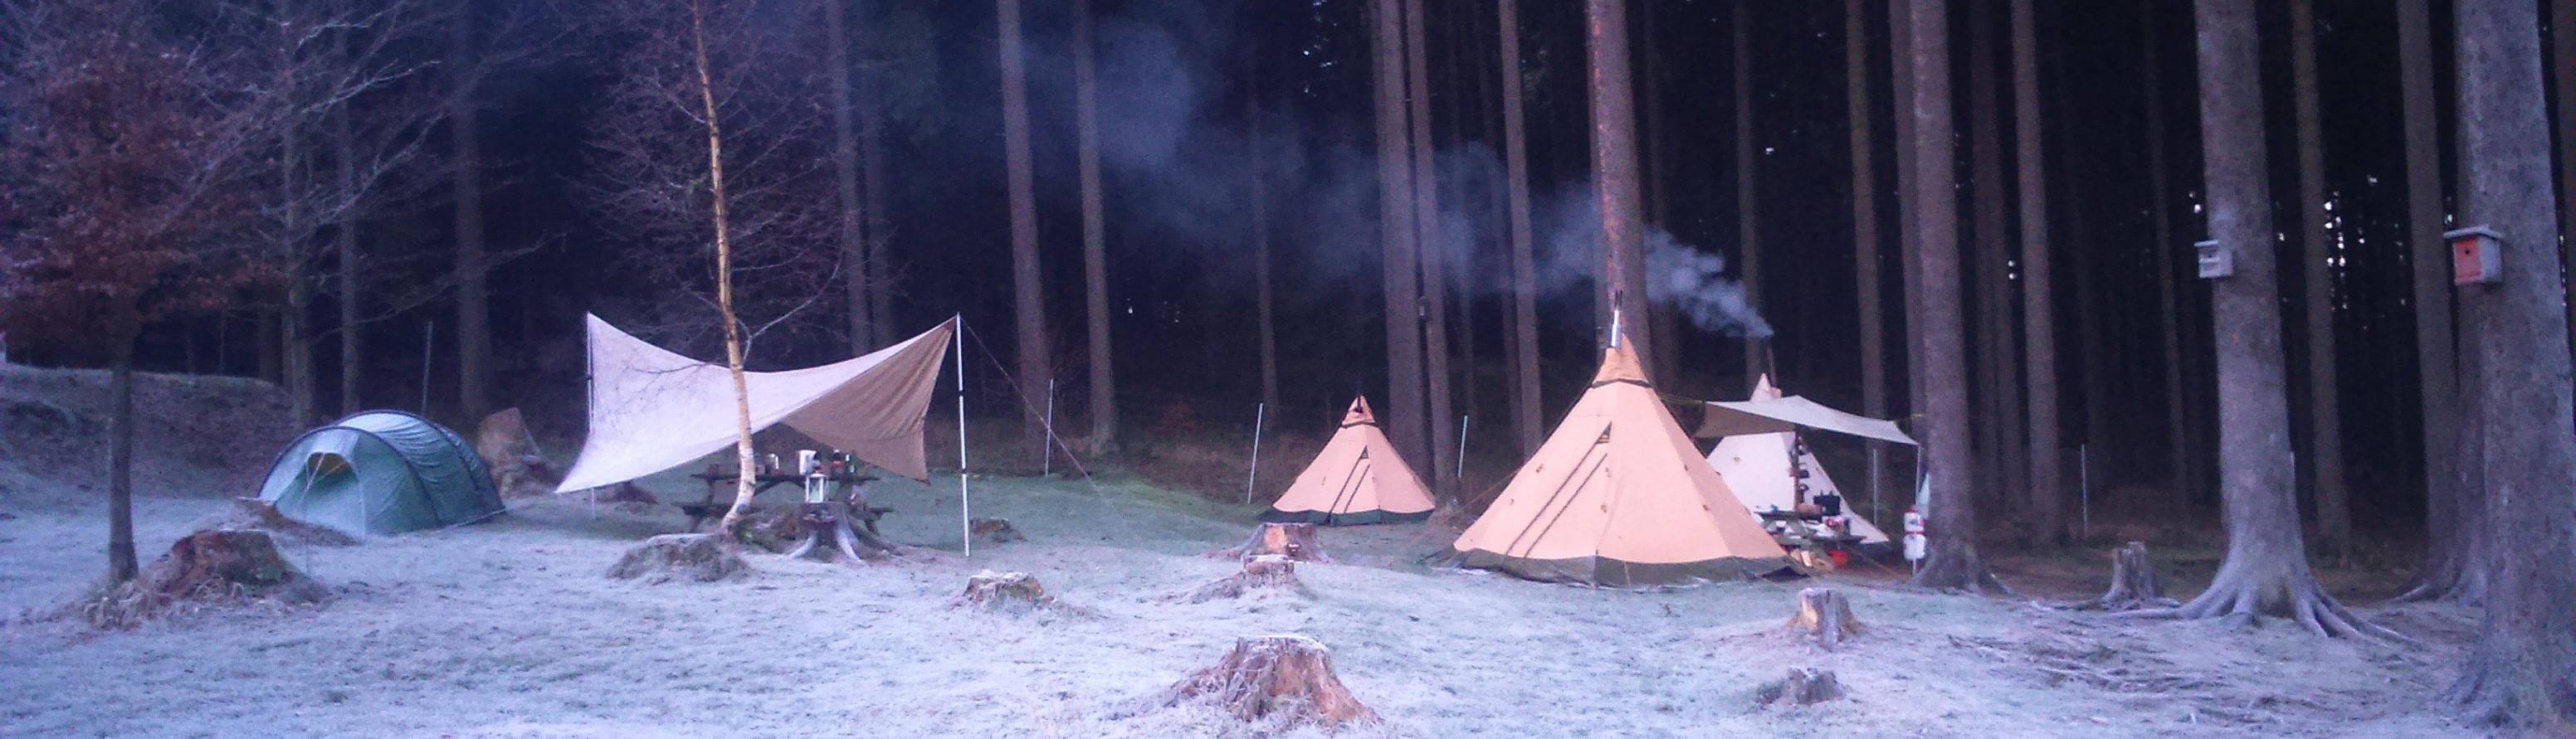 Sylvester Camp bei Harz-camping.de im Harz